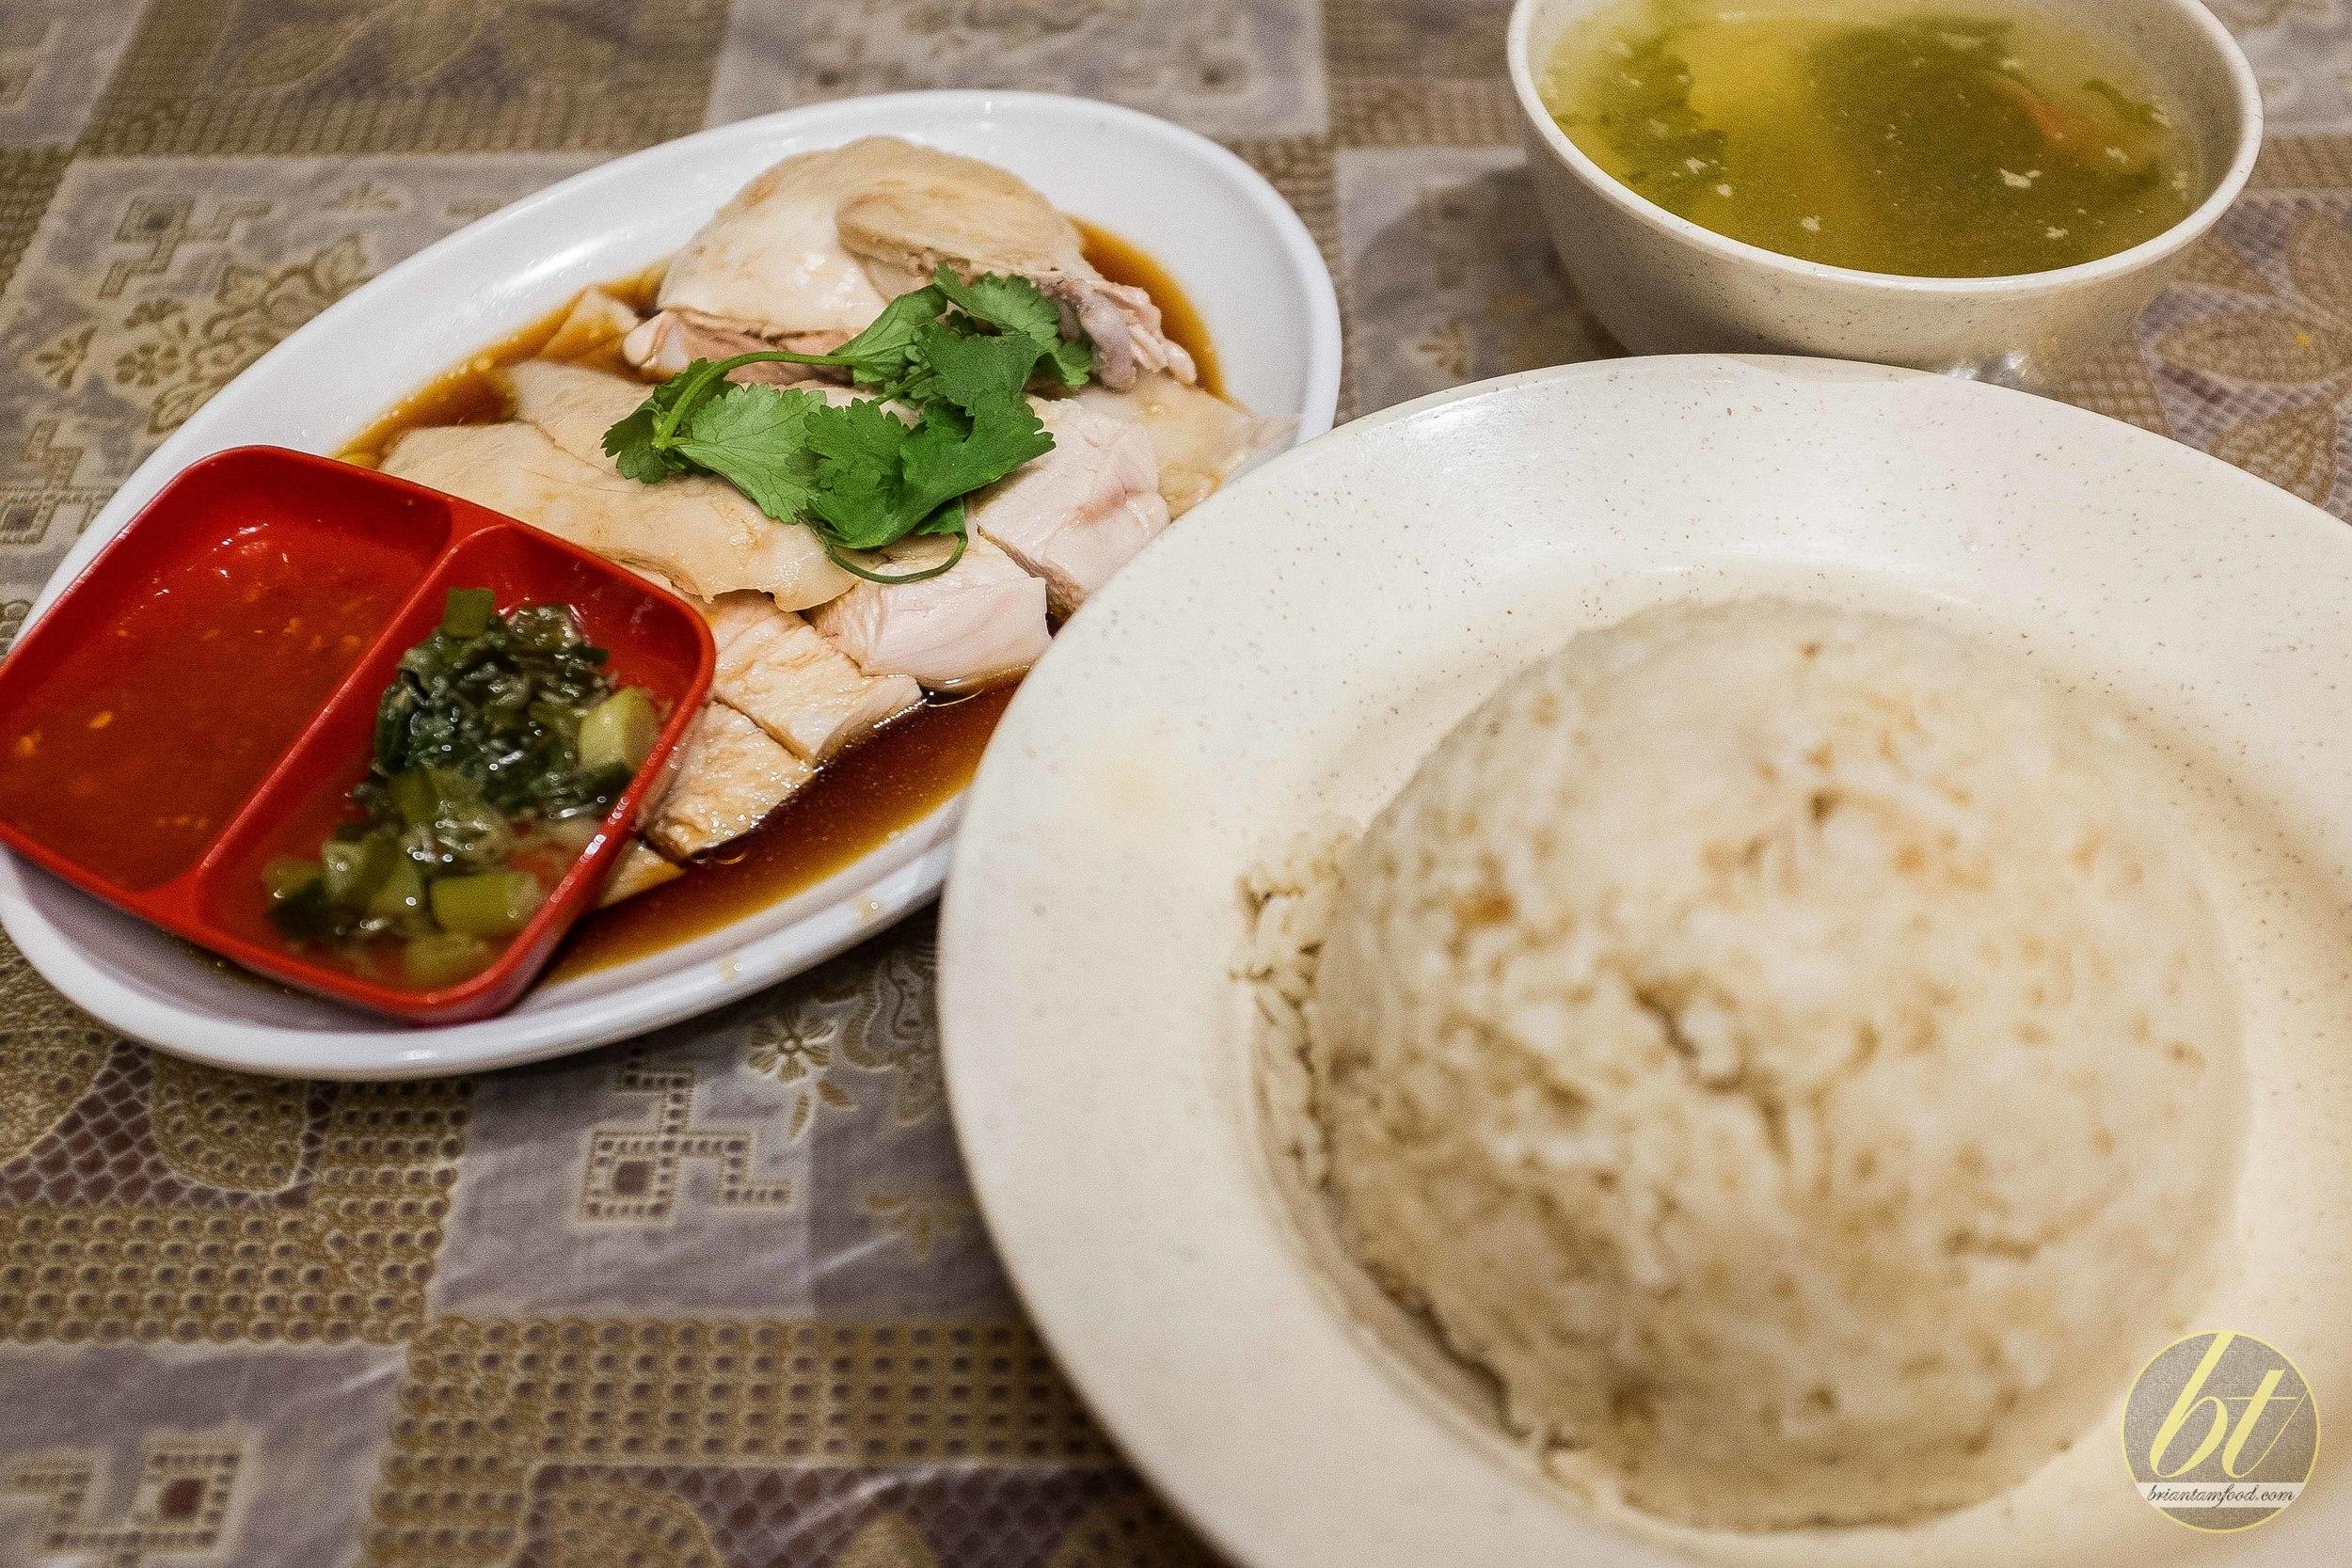 Albee's Malaysian Kitchen Campsie Hainan Chicken Rice